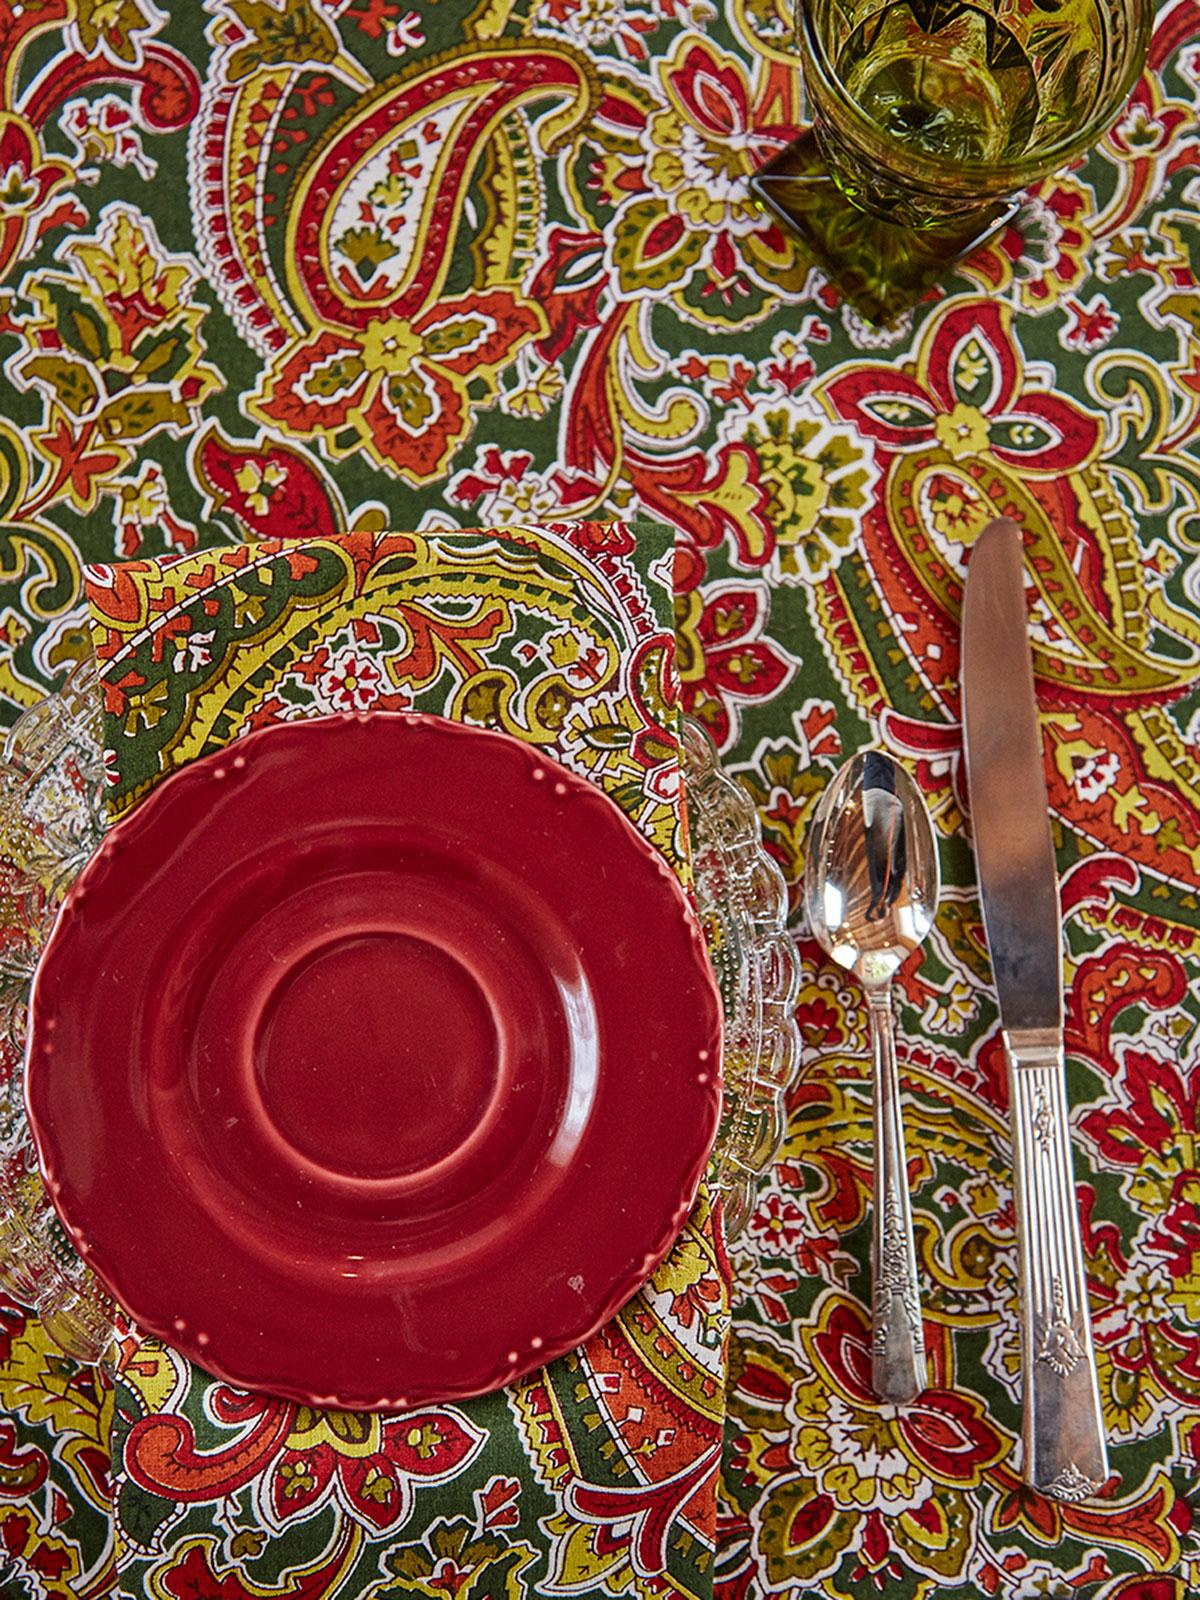 Priscilla's Paisley Tablecloth